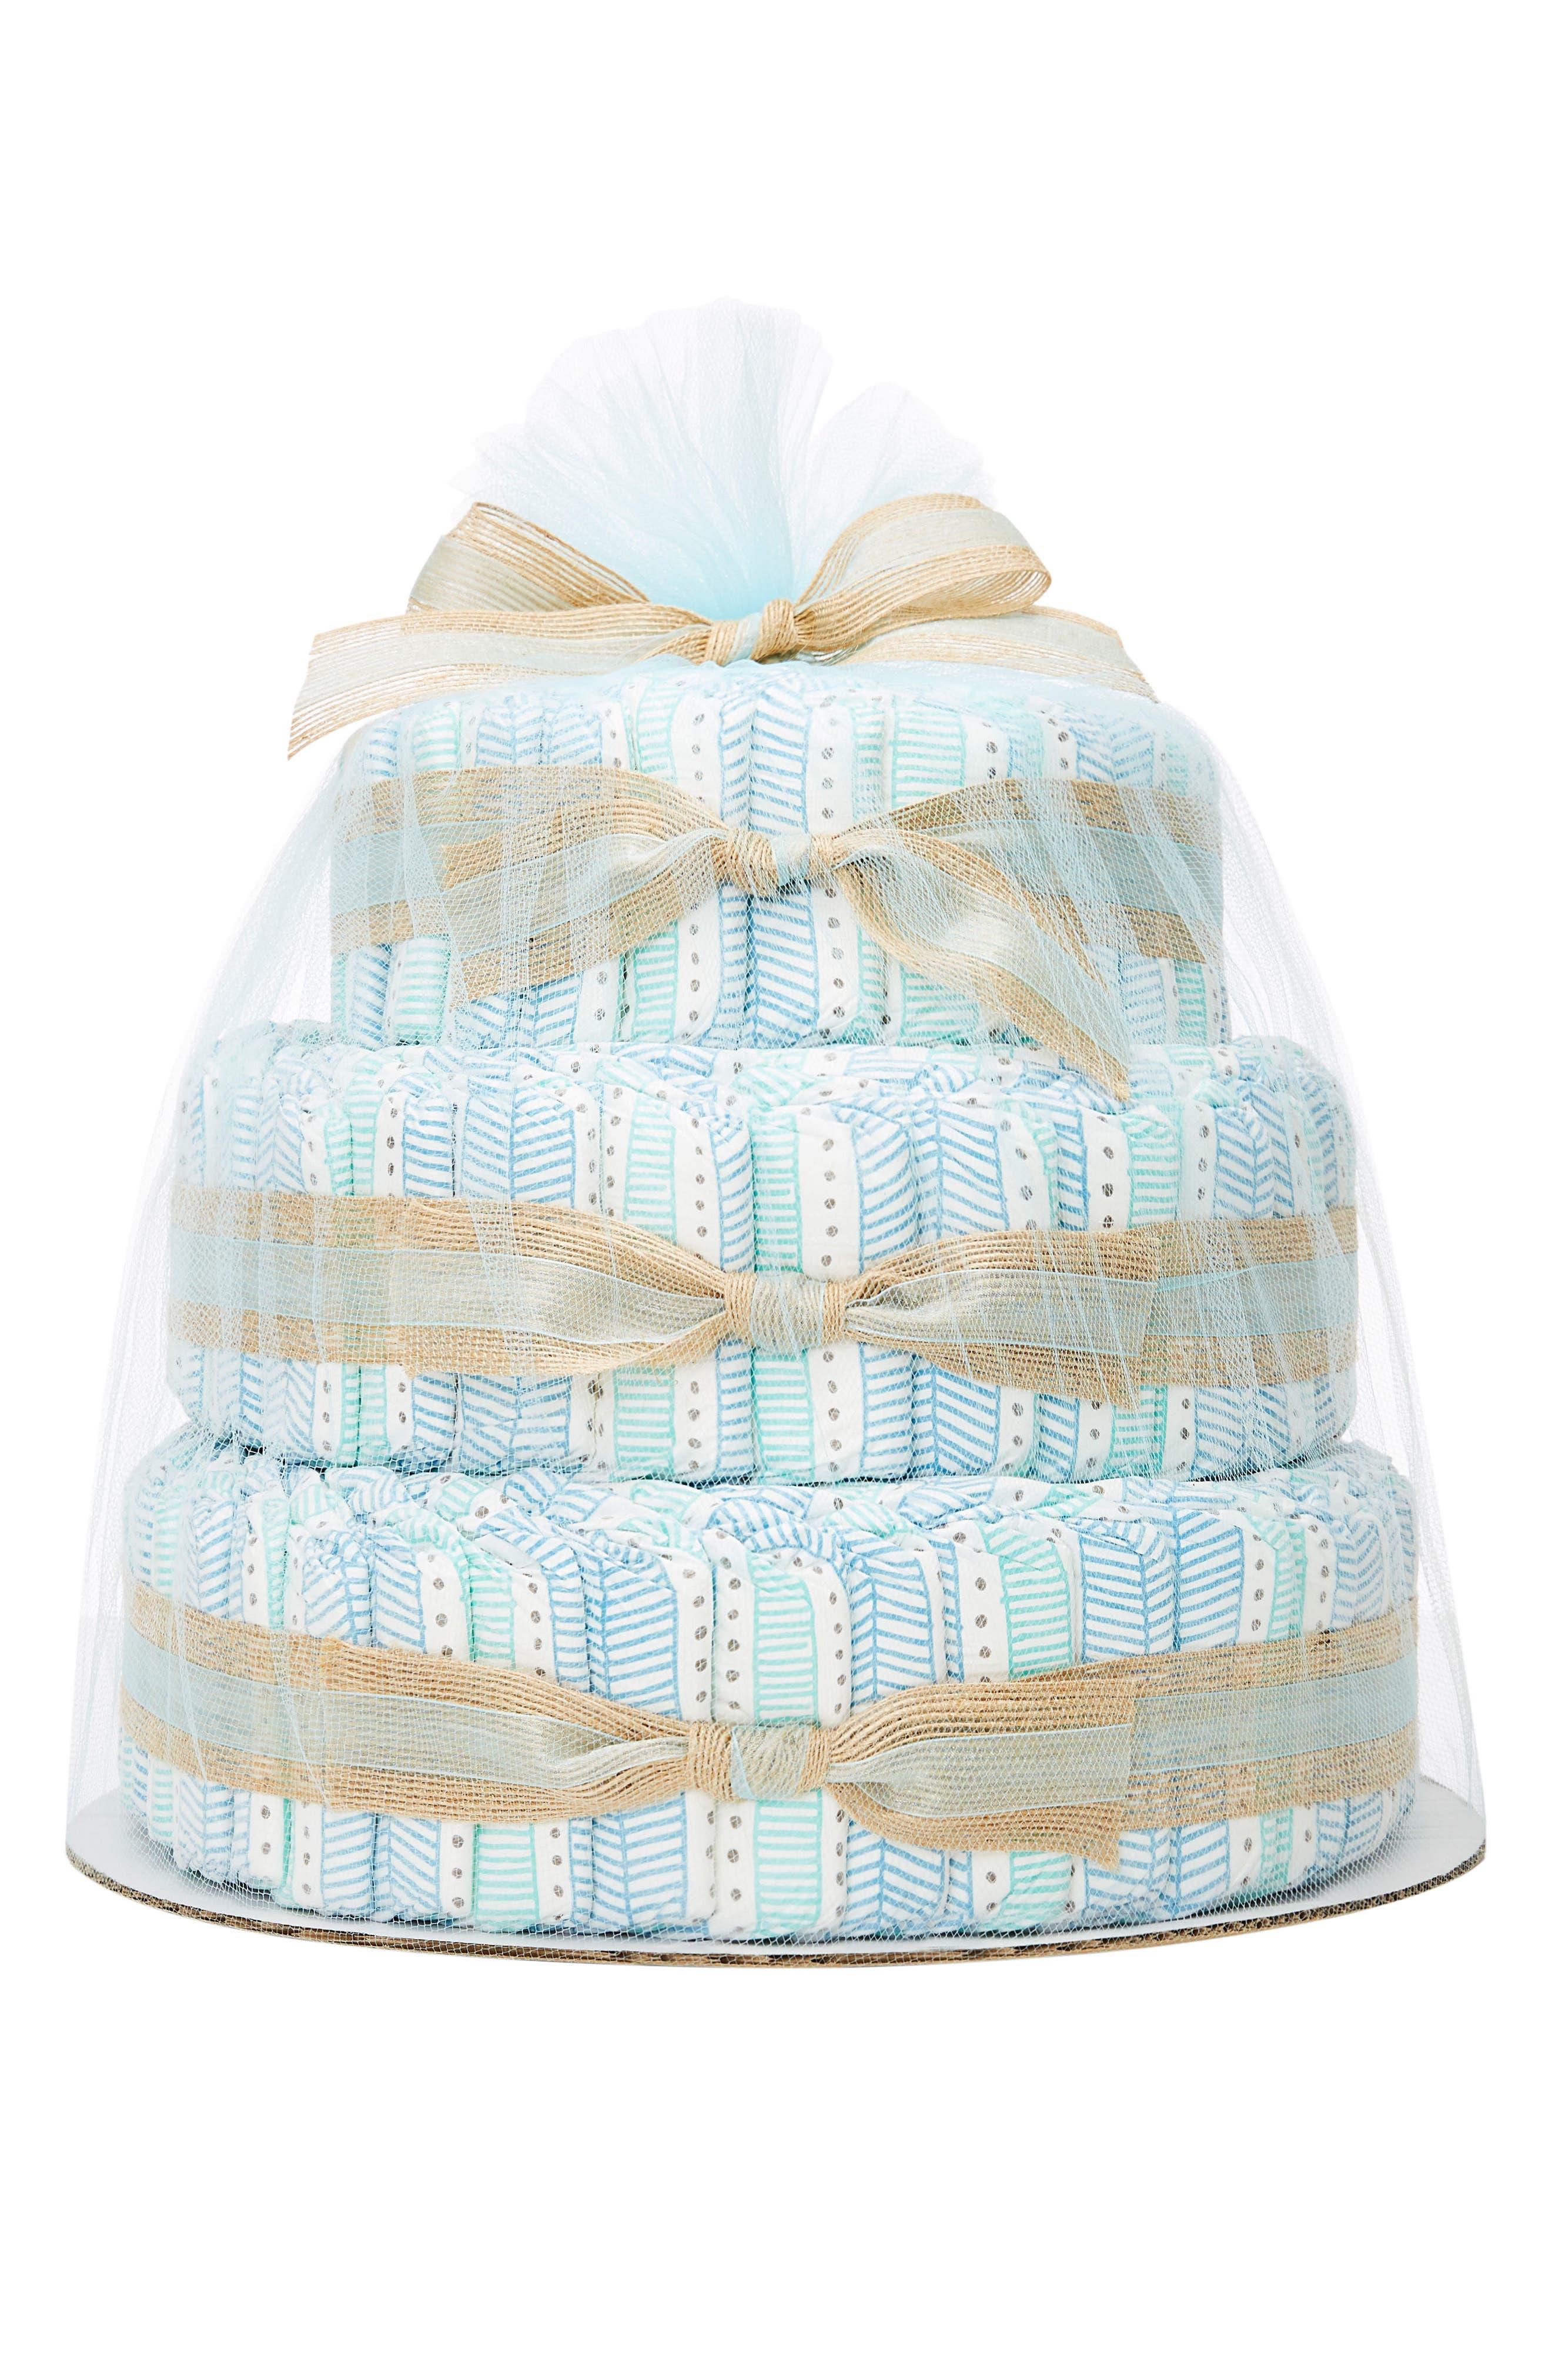 The Honest Company Large Diaper Cake & Full-Size Essentials Set